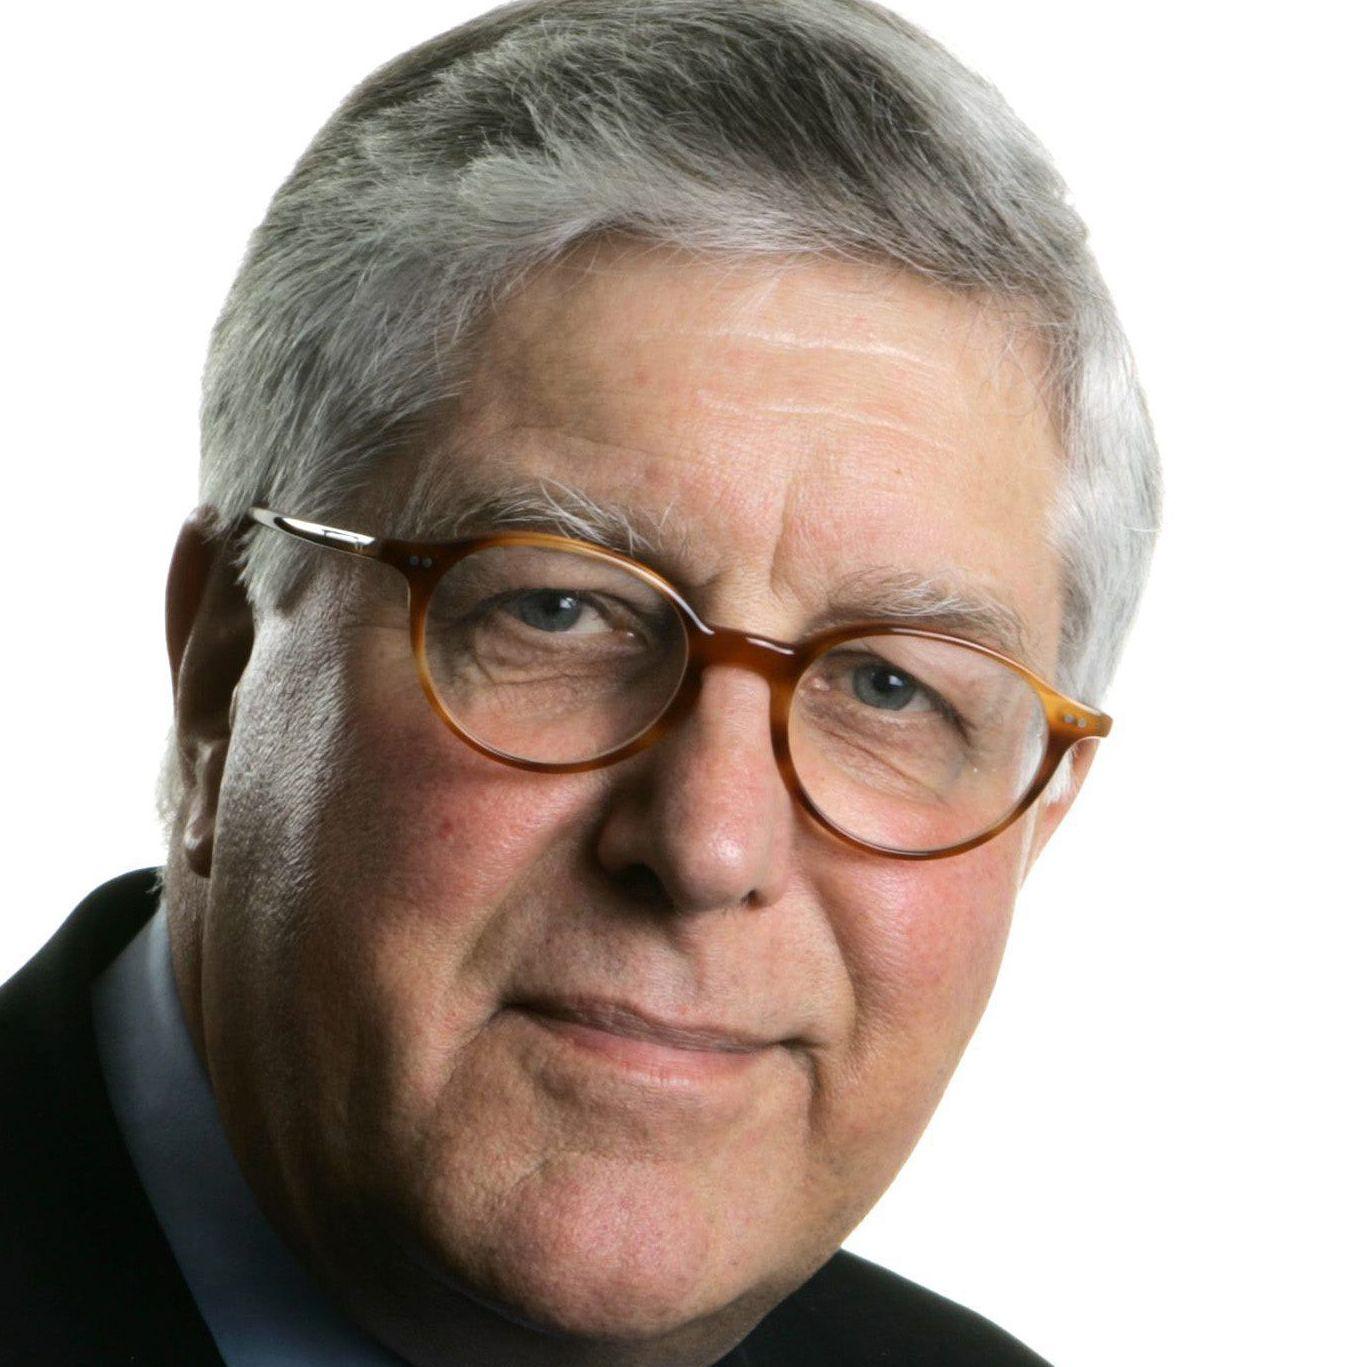 Nils Morten Udgaard